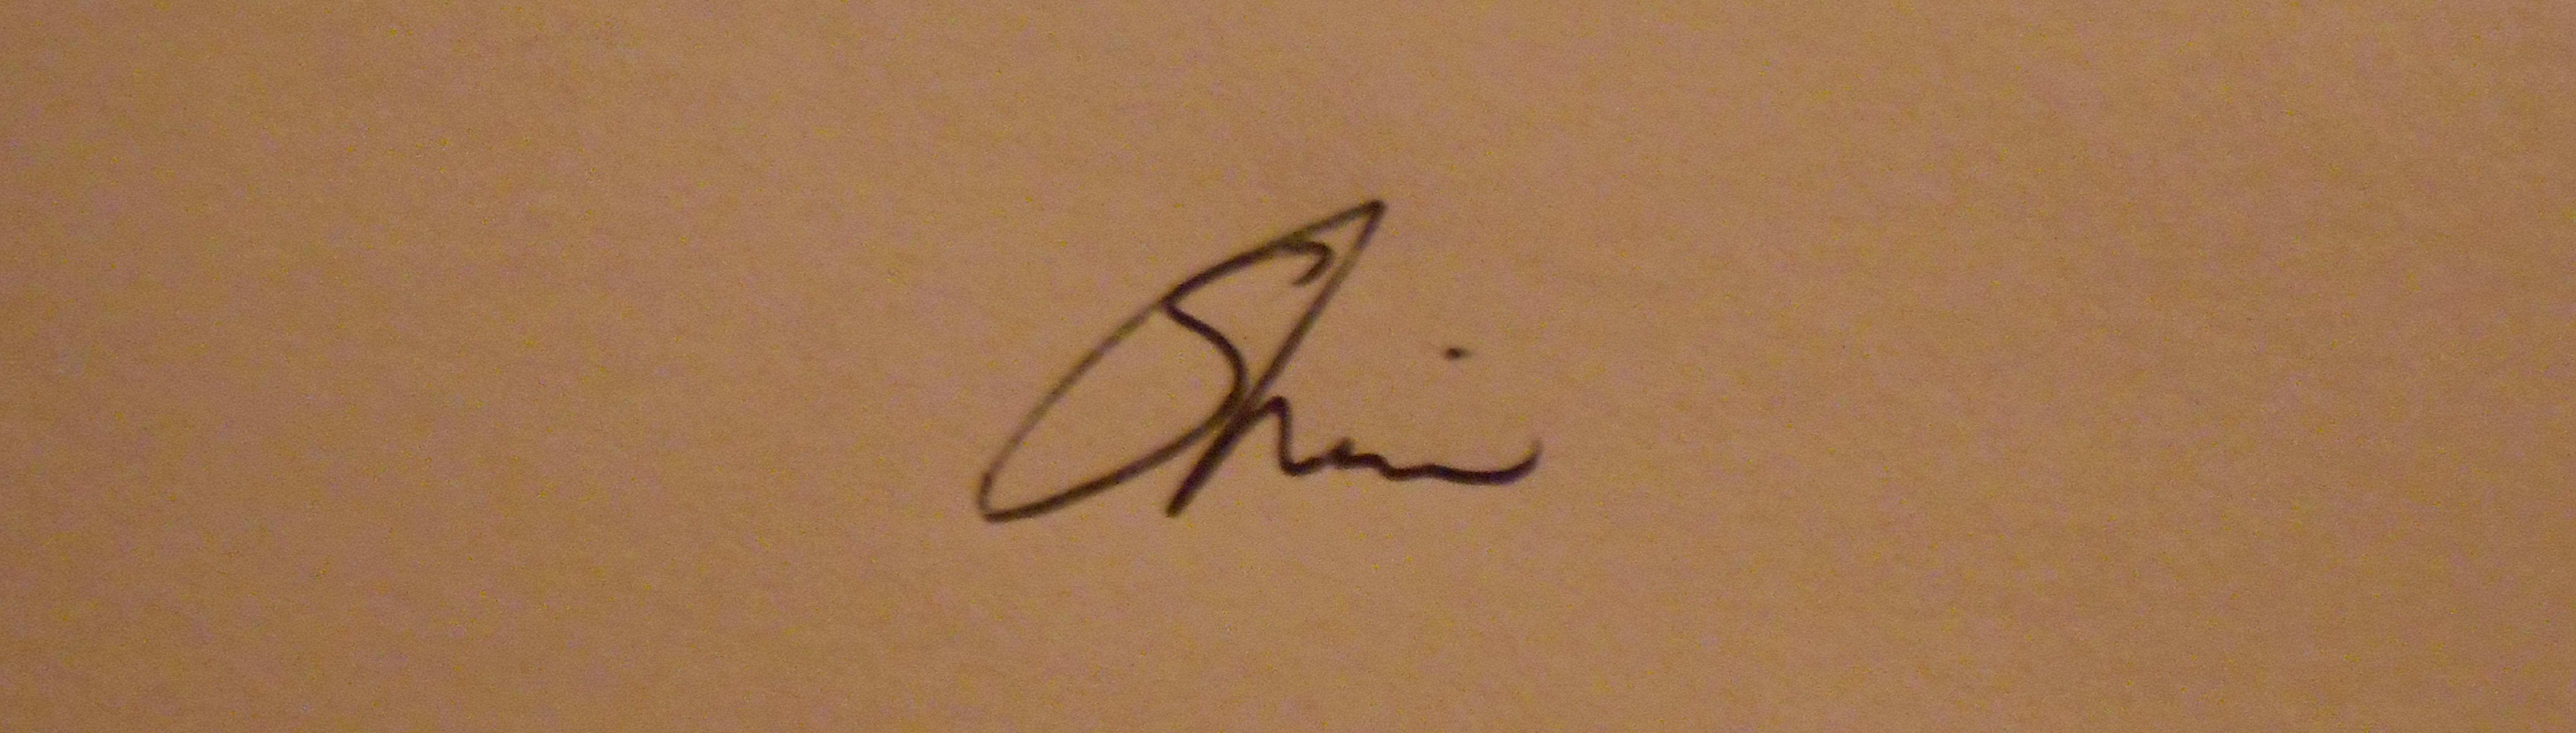 sherin's Signature